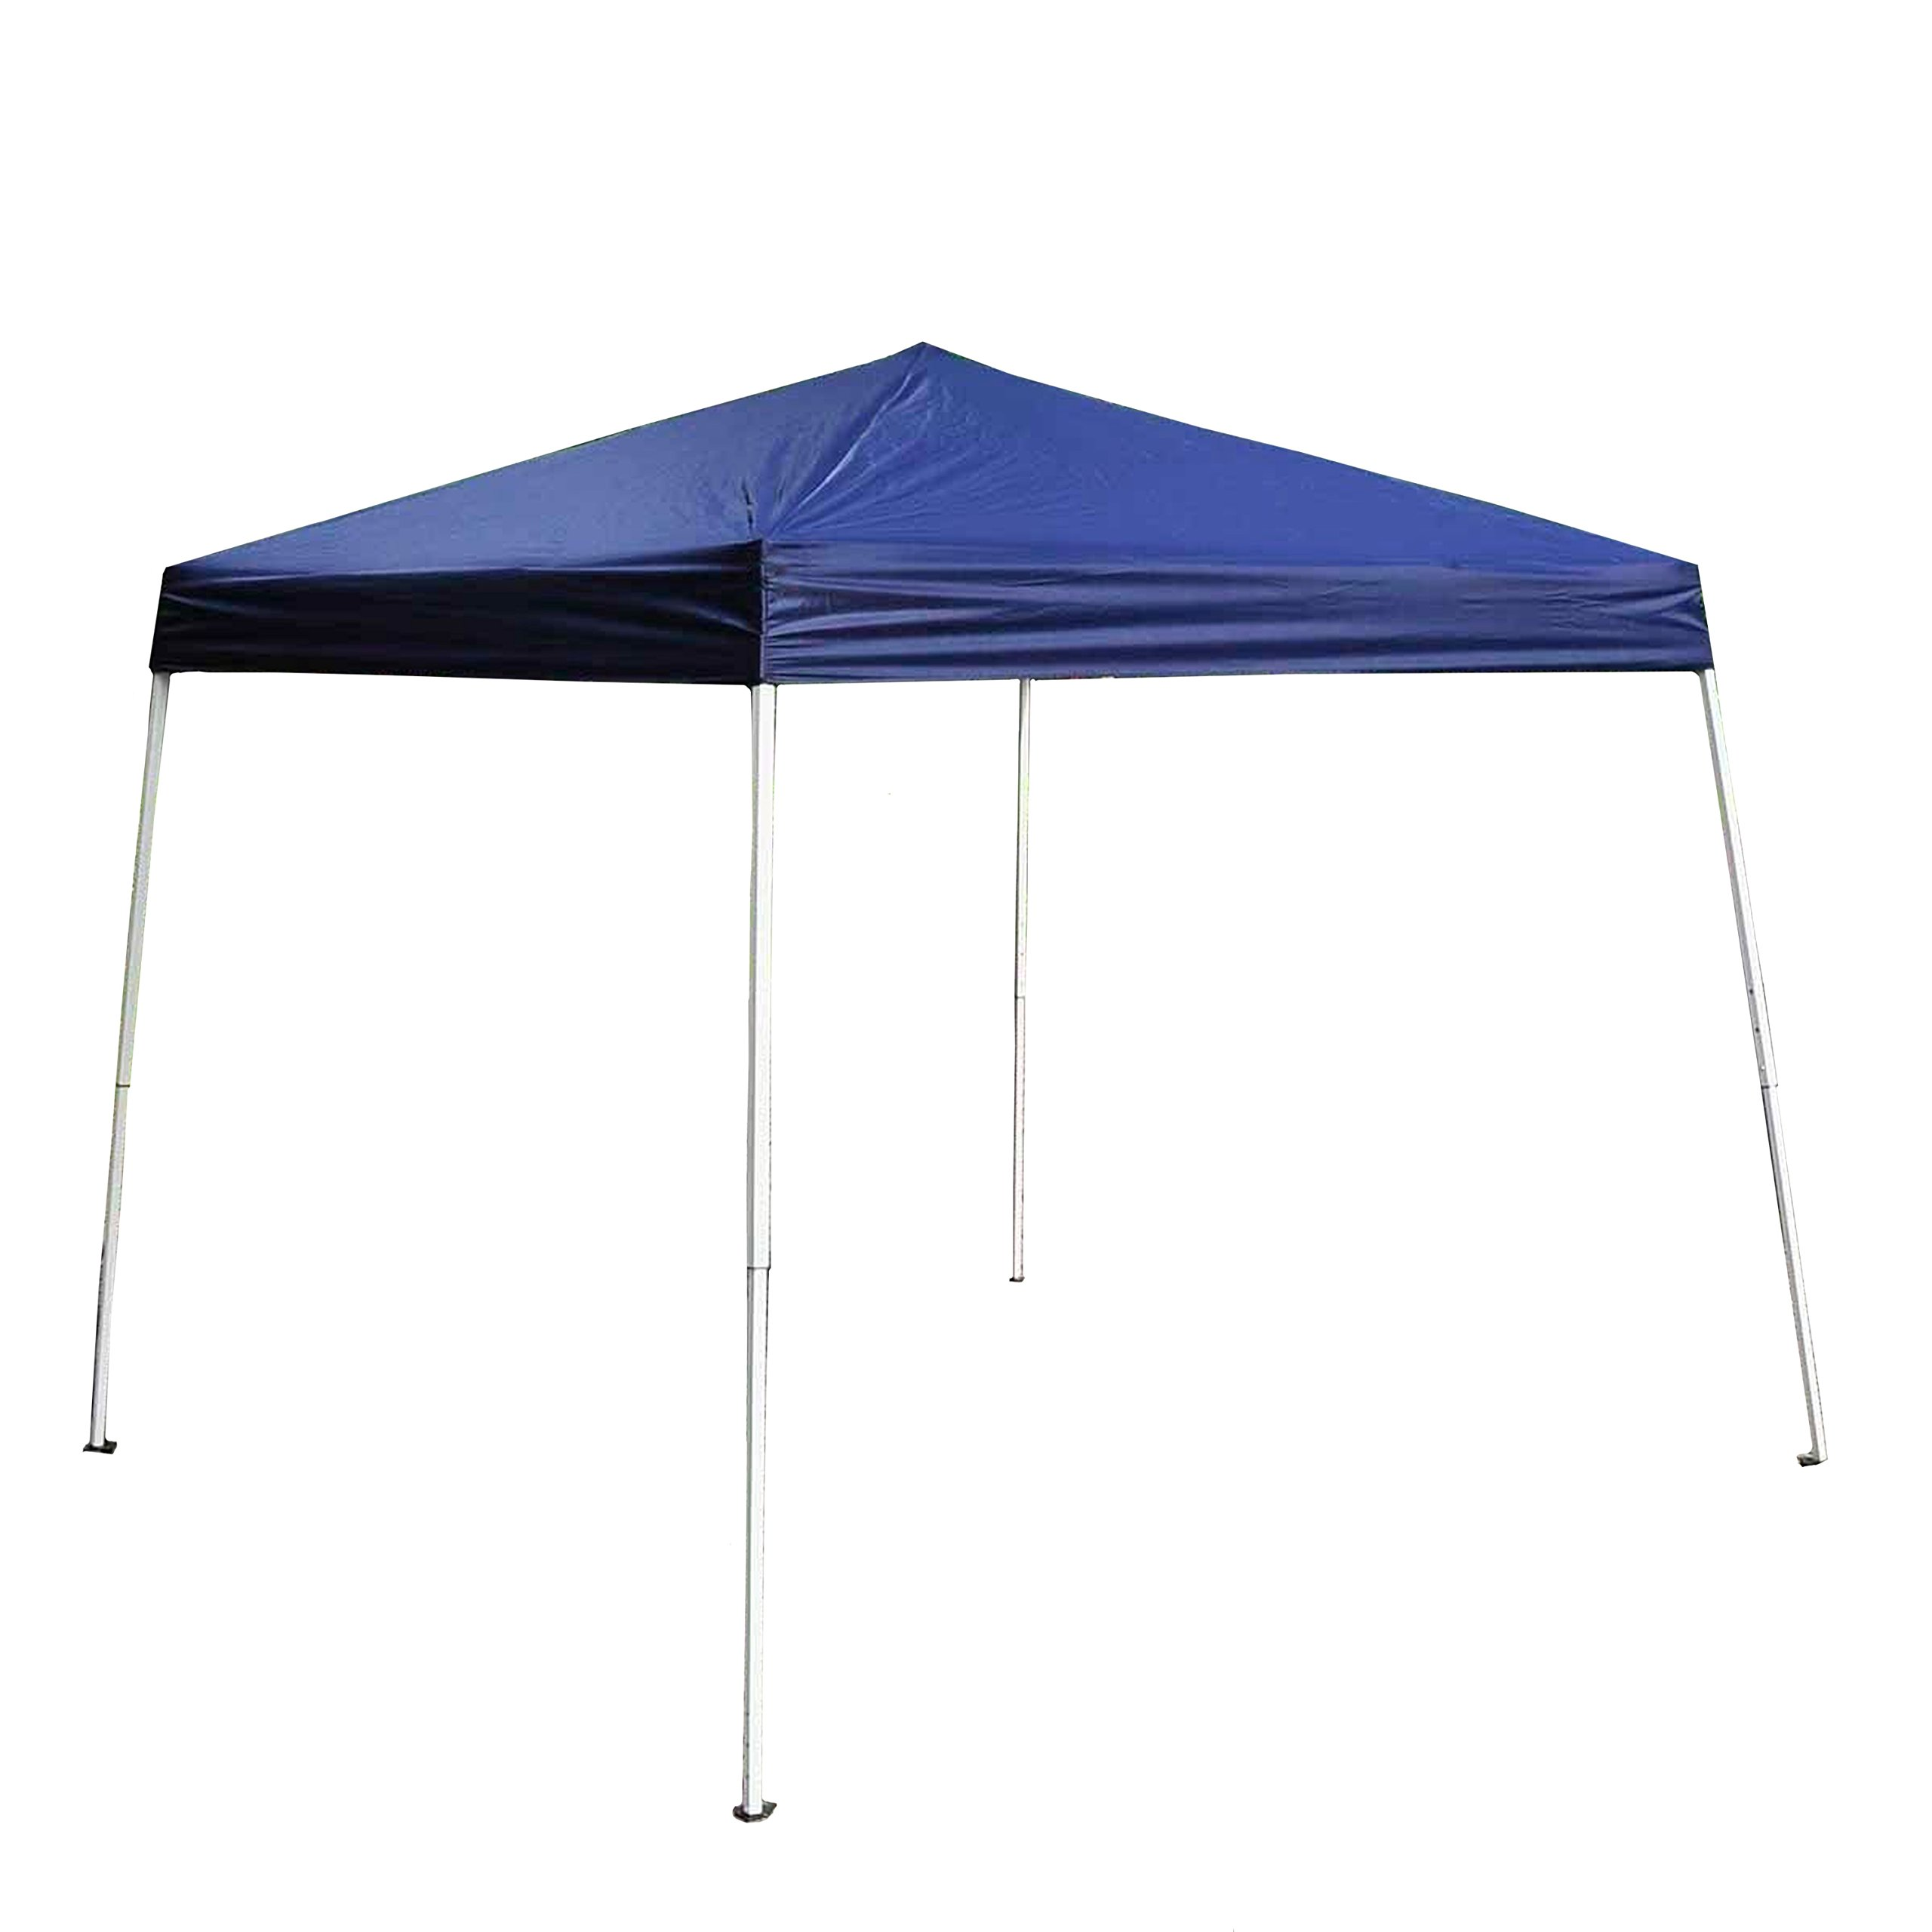 ALEKO GAZ8-10X8-10B Foldable Popup Polyester Gazebo Canopy Patio Coffee Shelter 8 x 8 Feet Blue